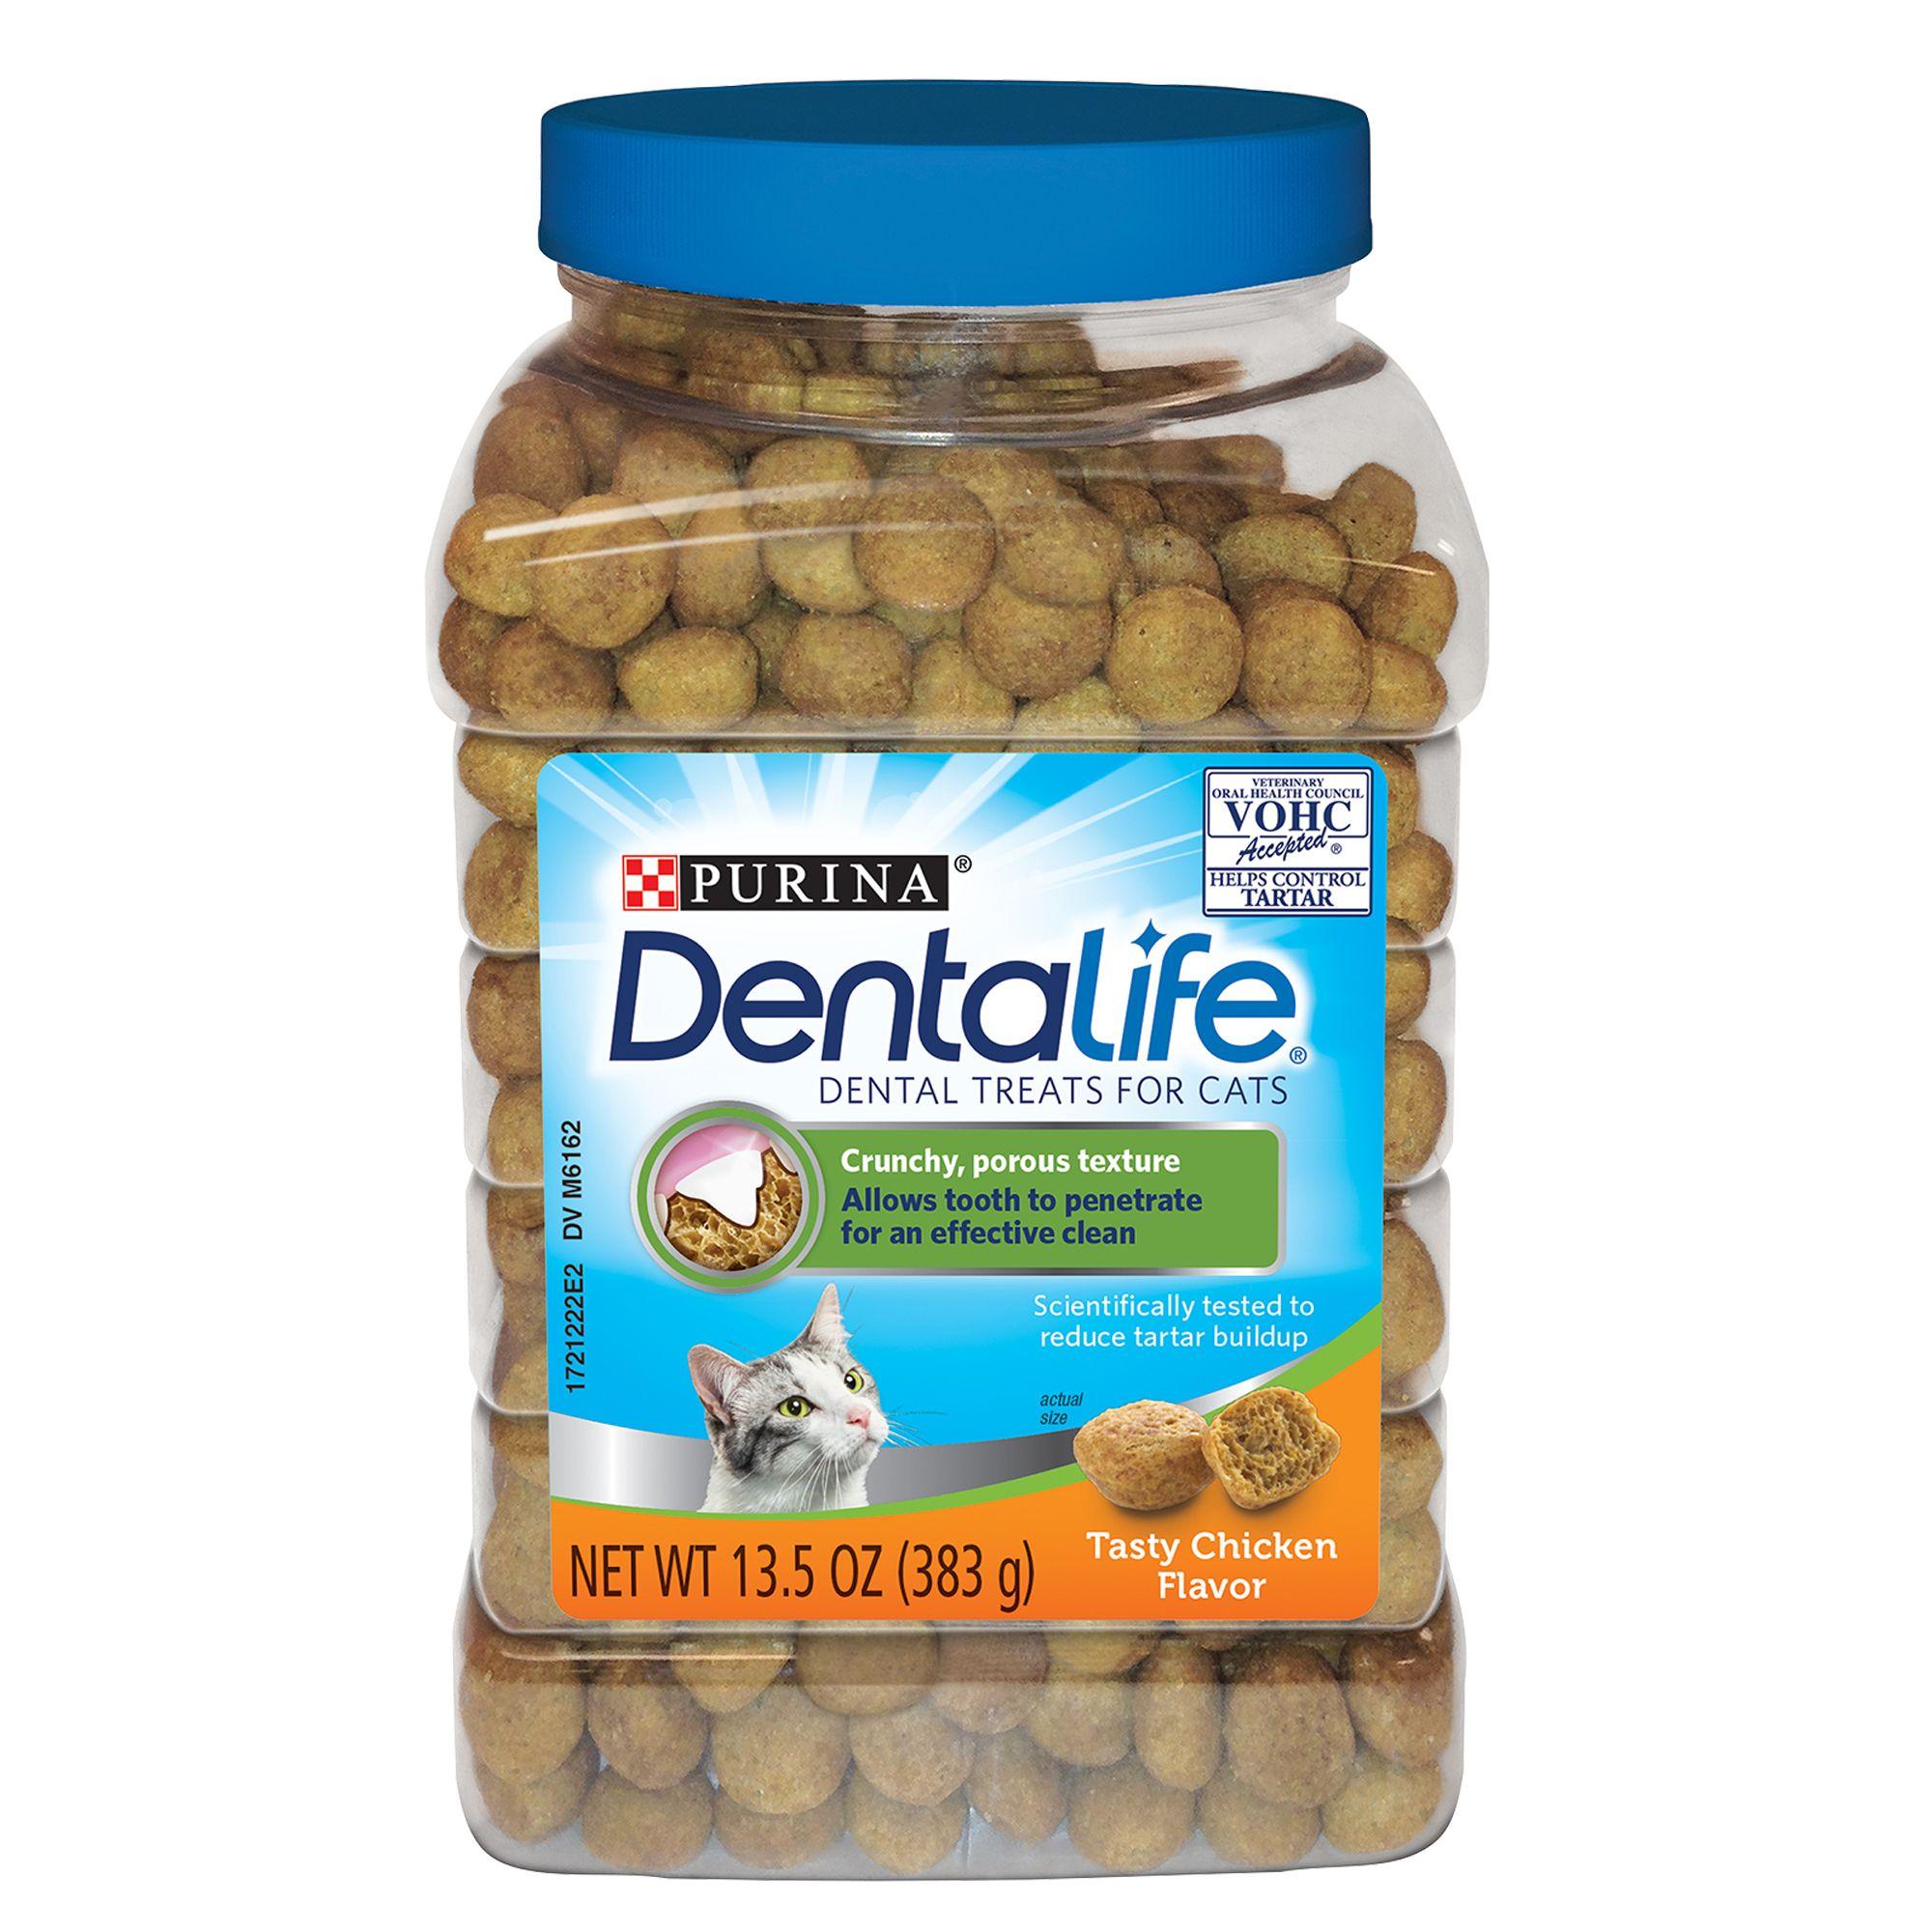 Purina Dentalife Dental Cat Treats Chicken Size 13.5 Oz